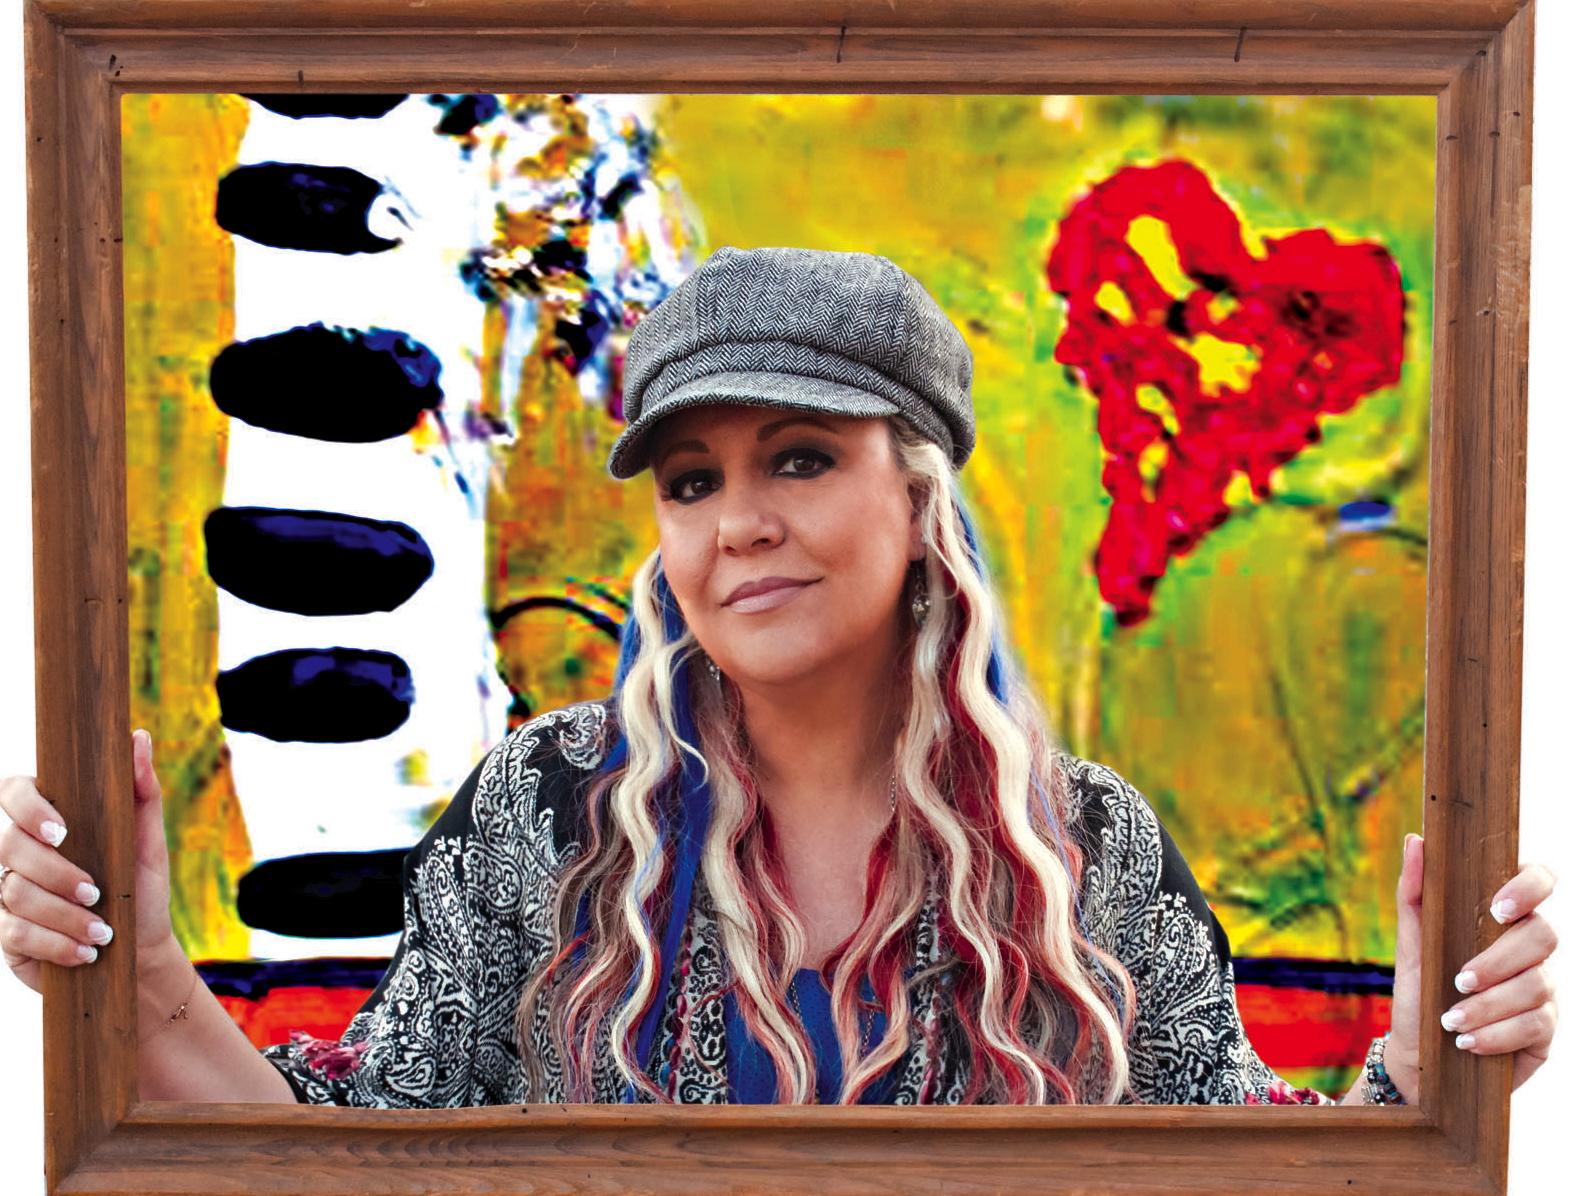 Lena Prima, daughter of music legend Louis Prima, appearing at the CasaBlanca Showroom on Nov. 7